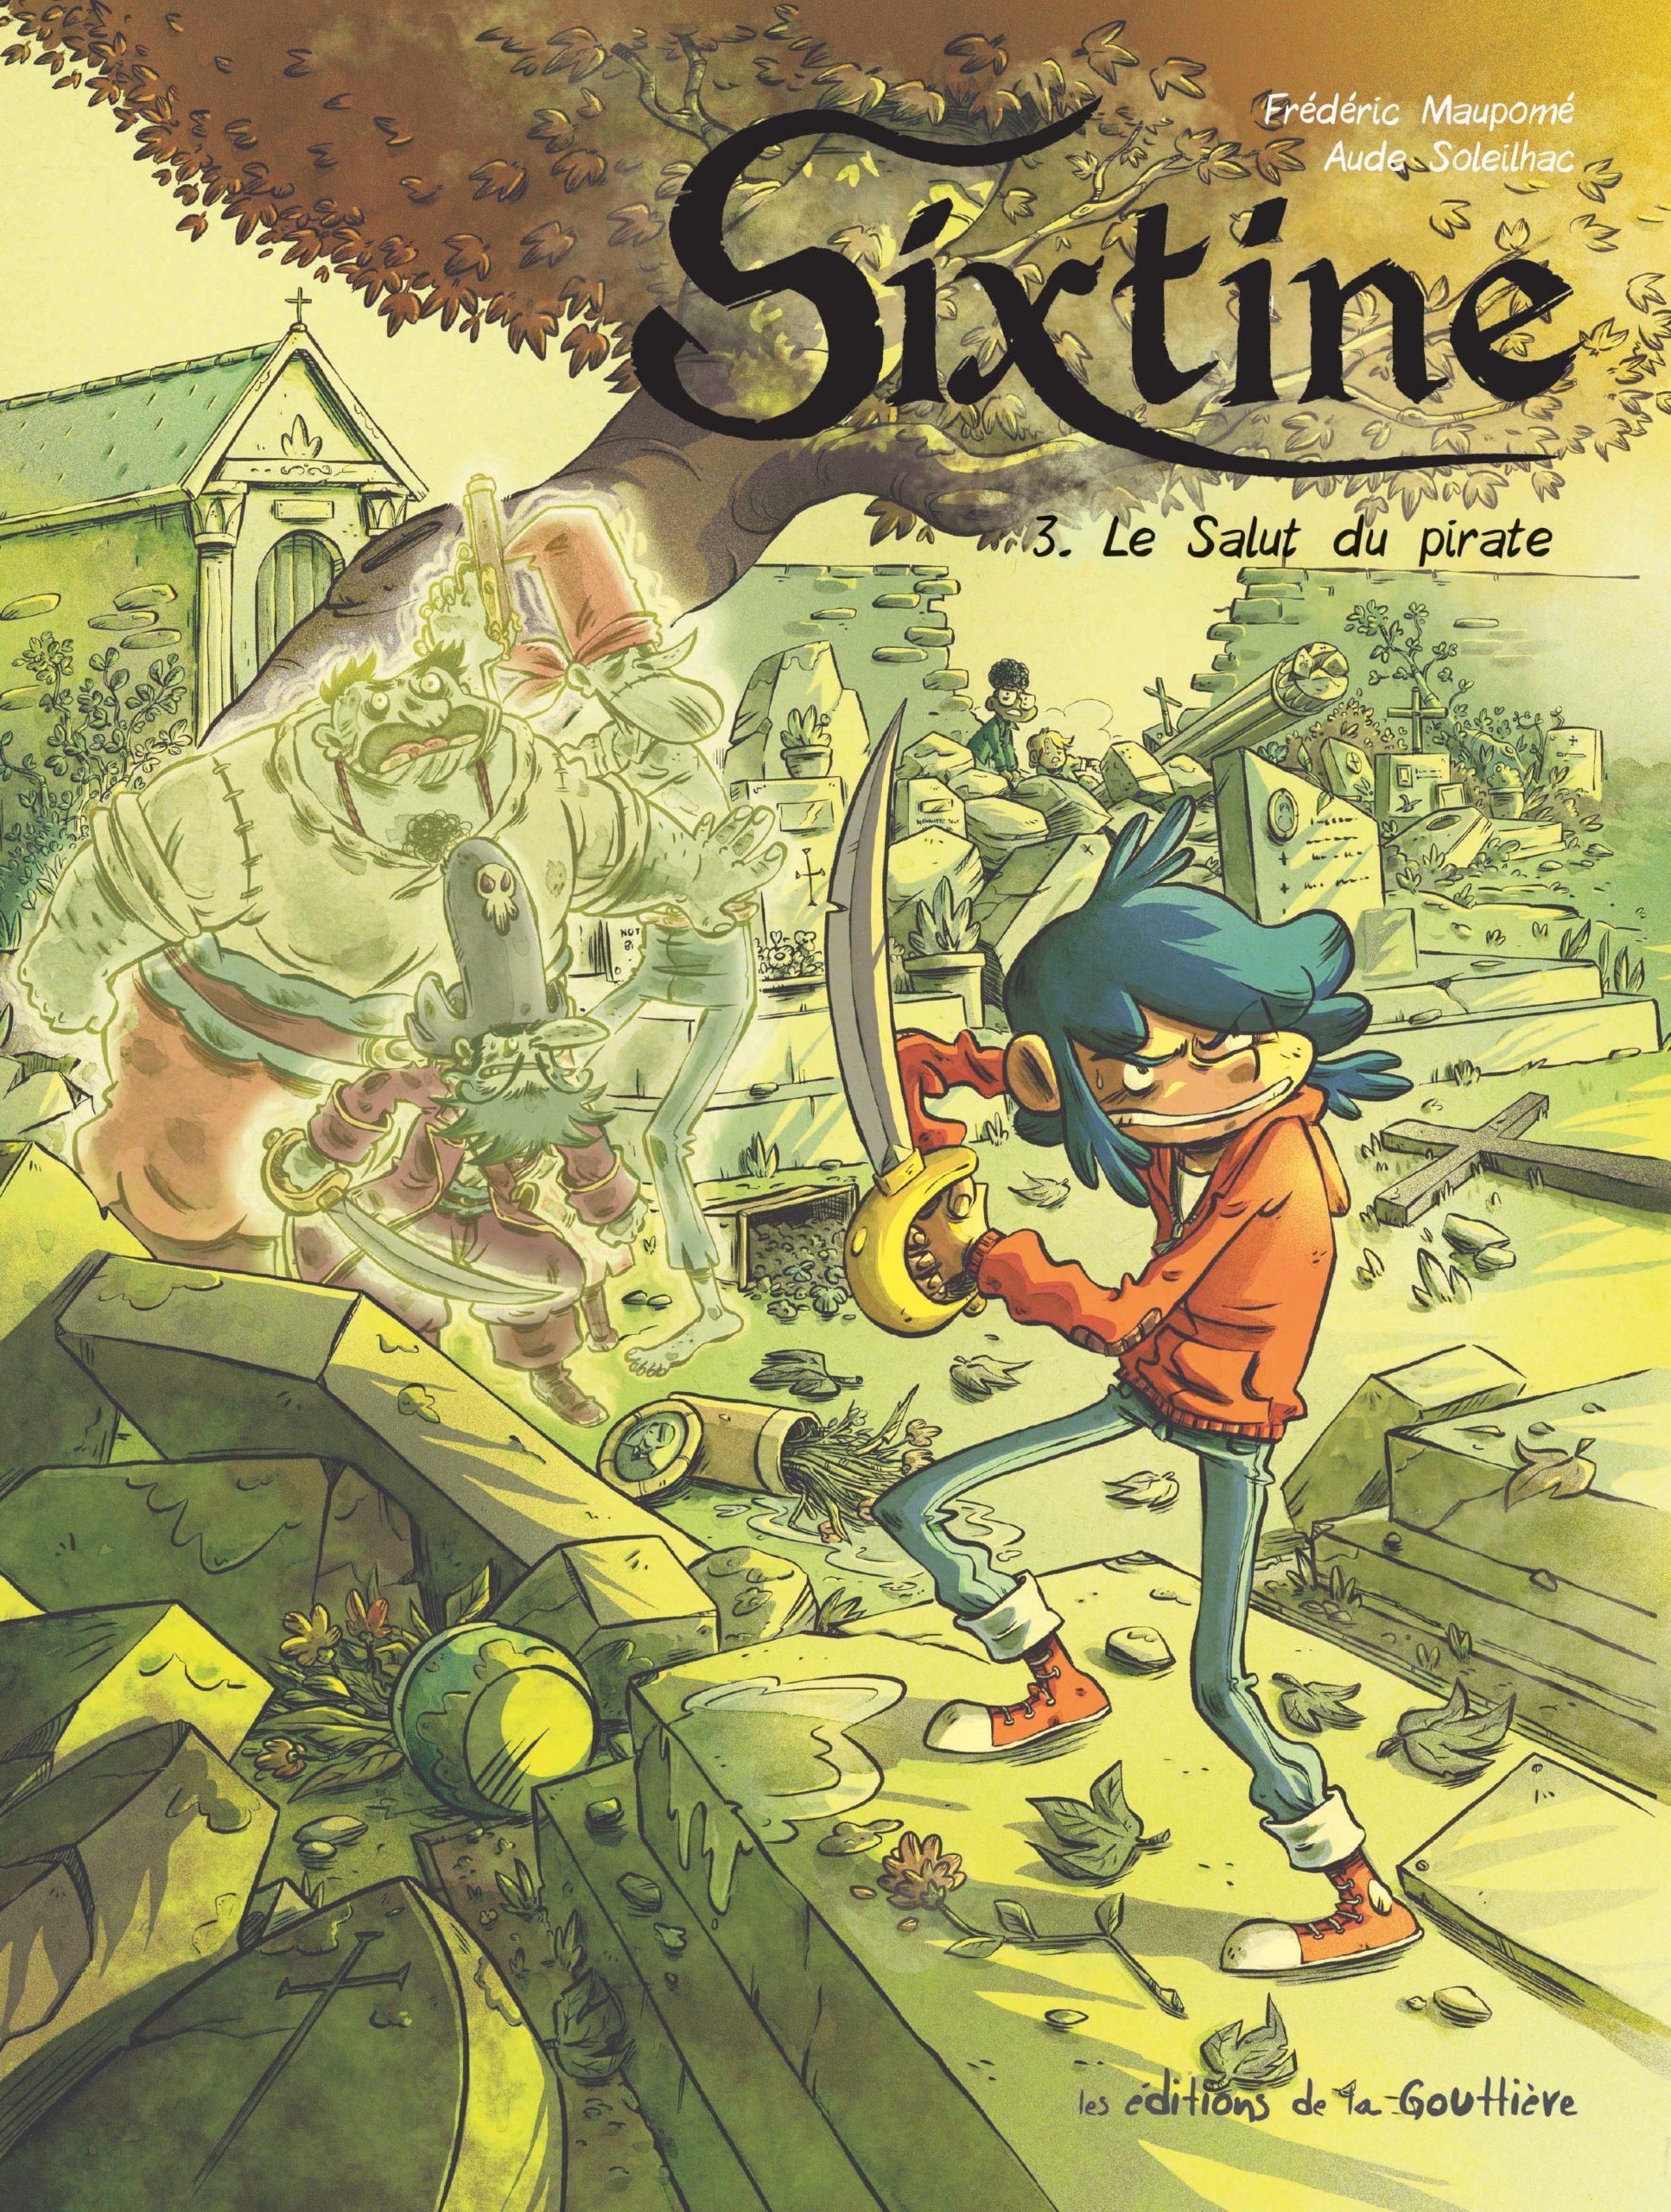 Sixtine3